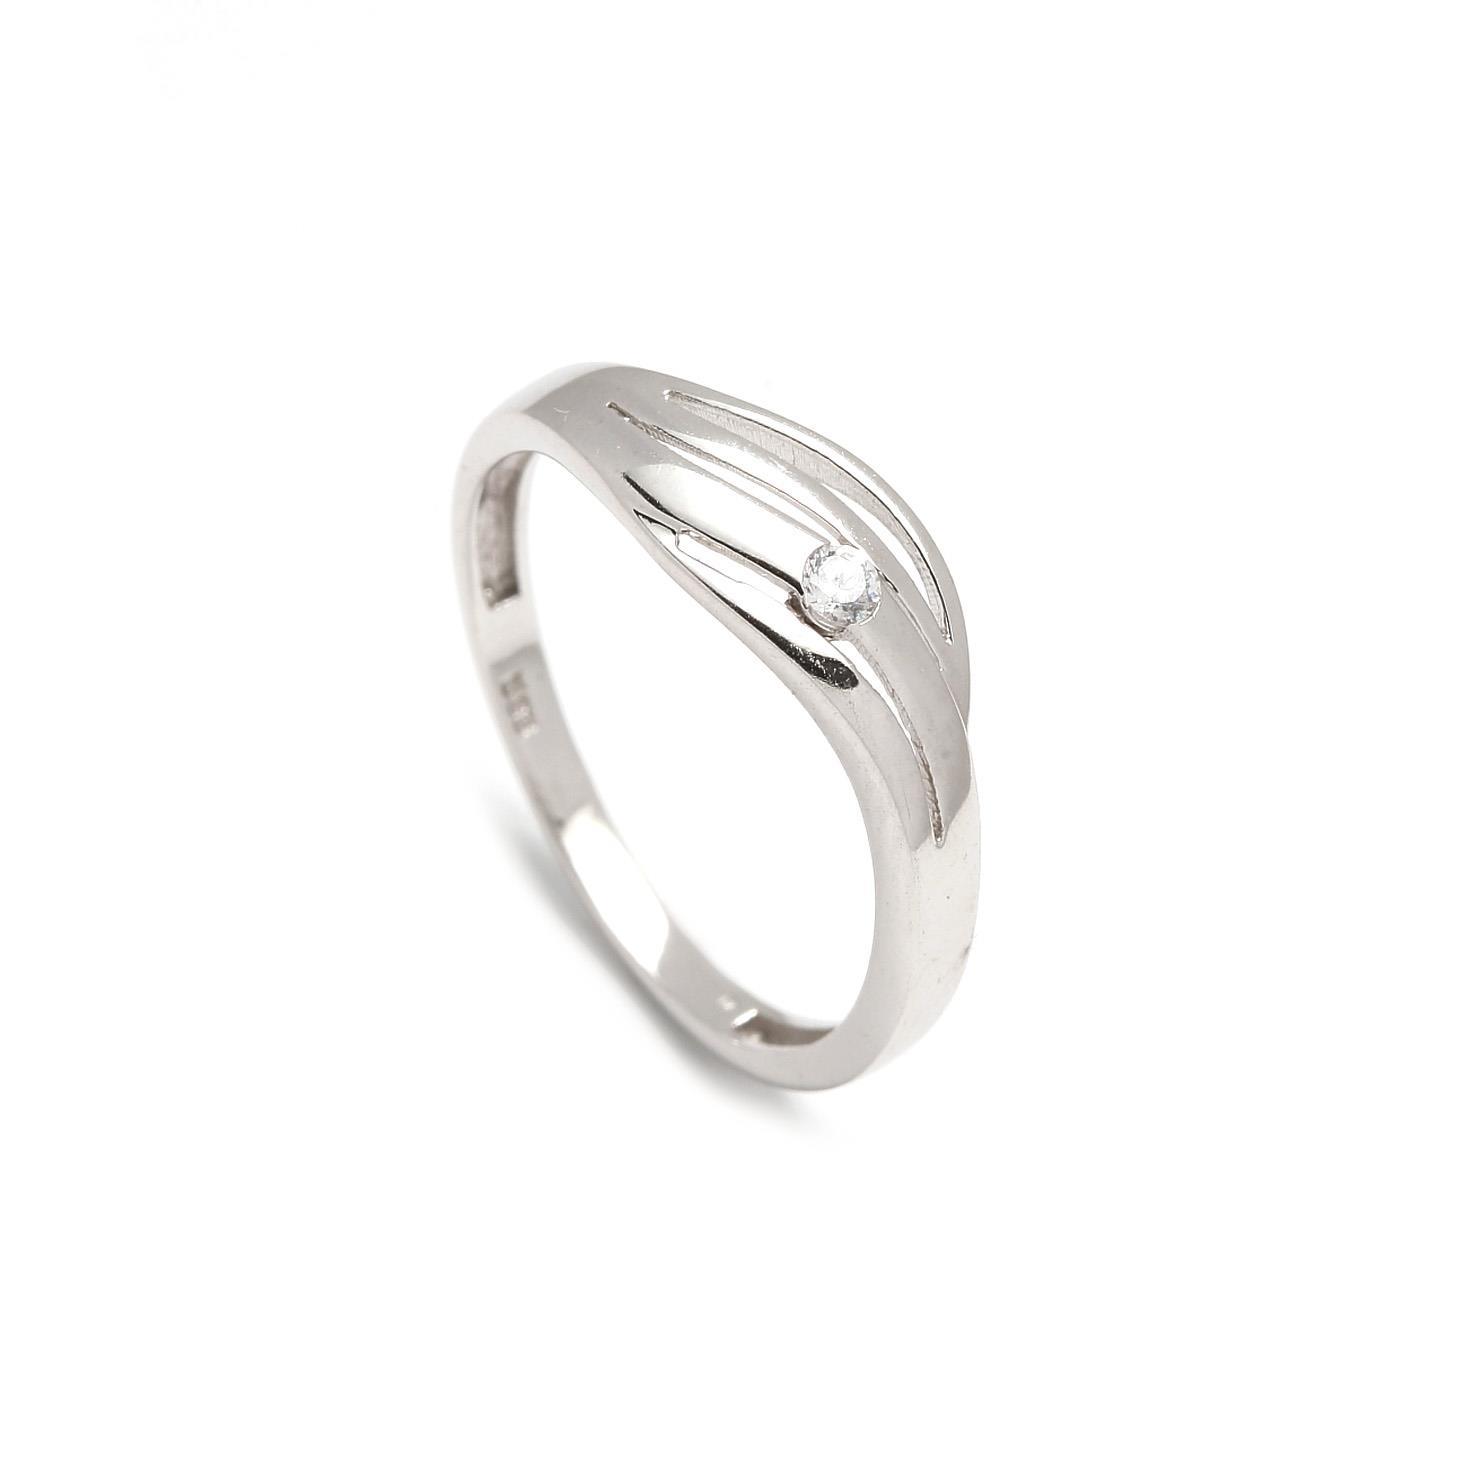 Zlatý dámsky prsteň GRAZIANA 1PB00089